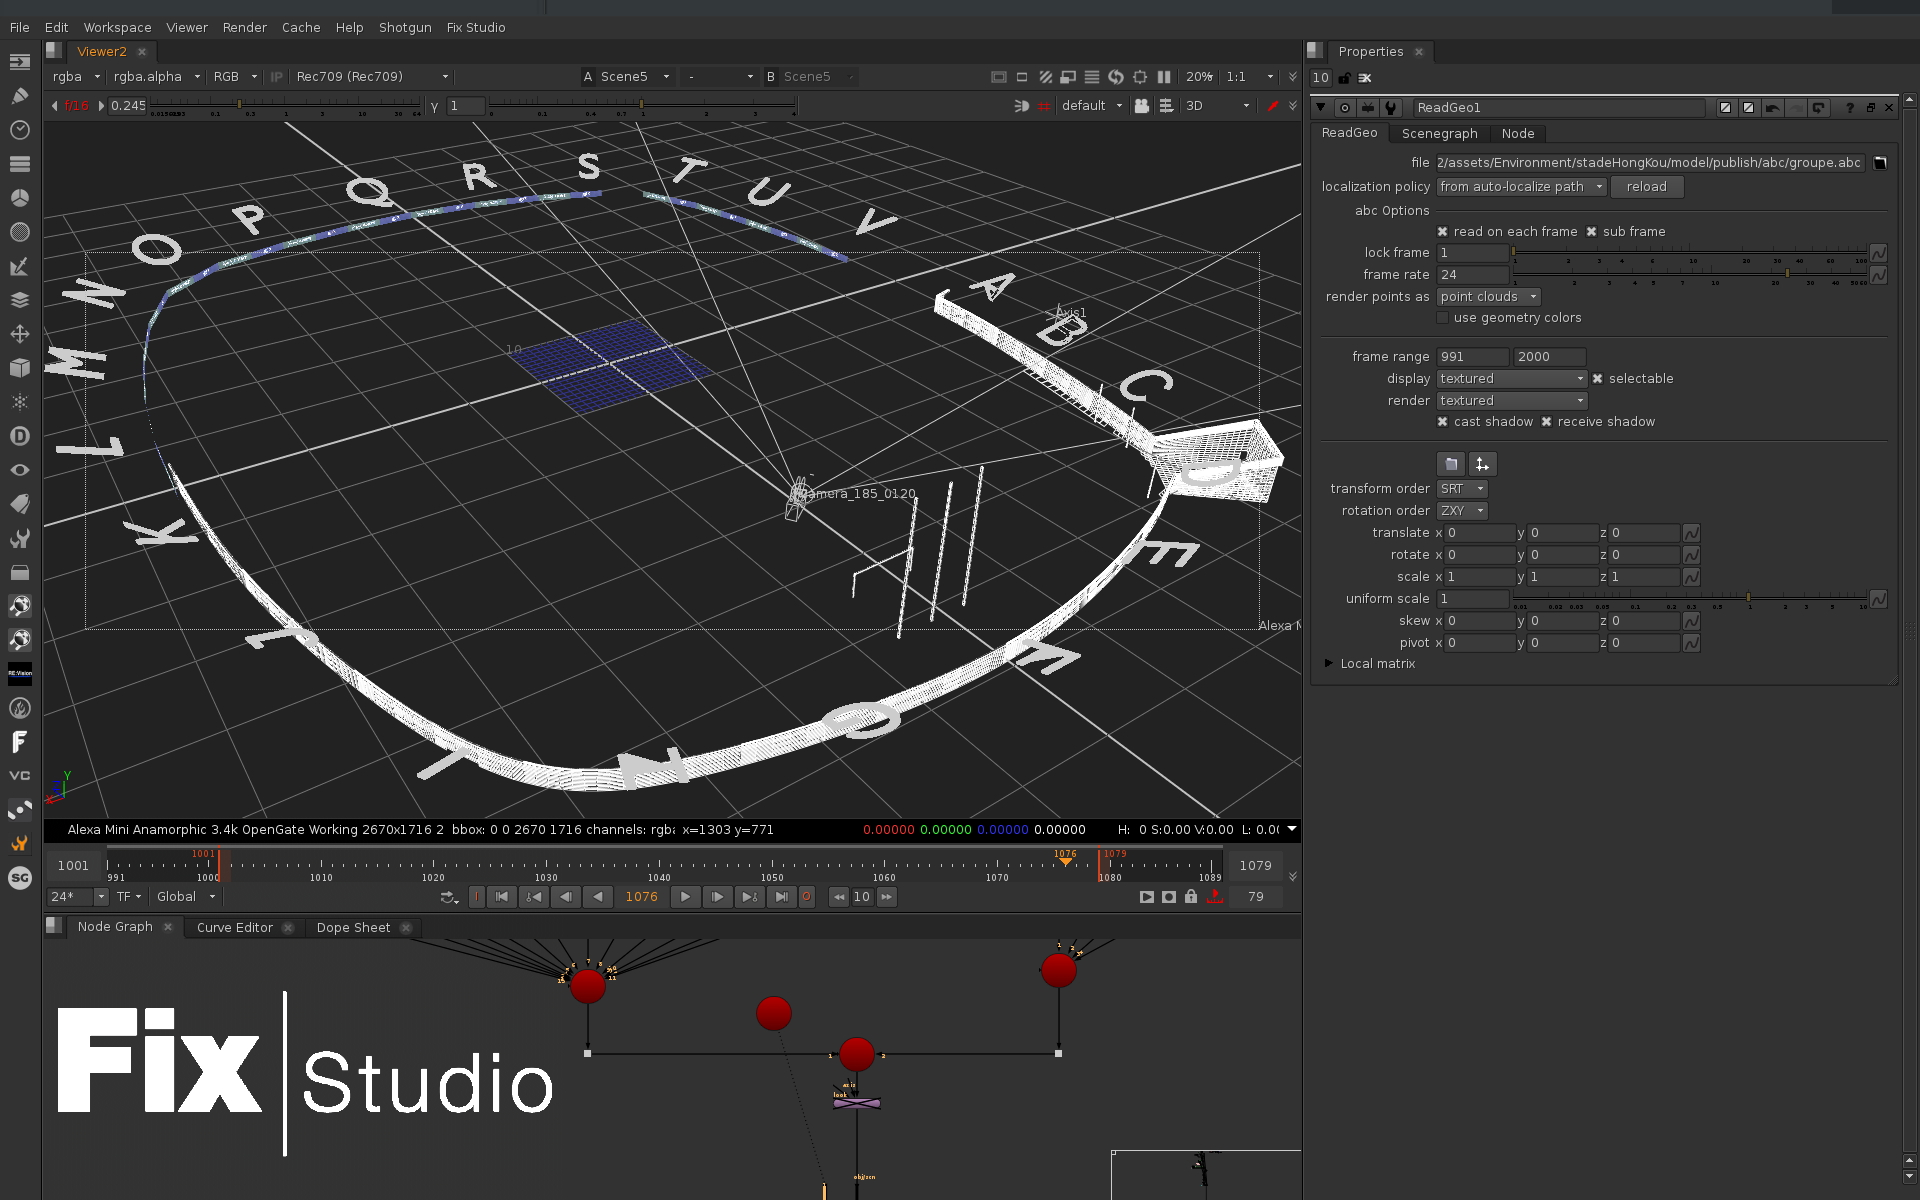 Fix Studio